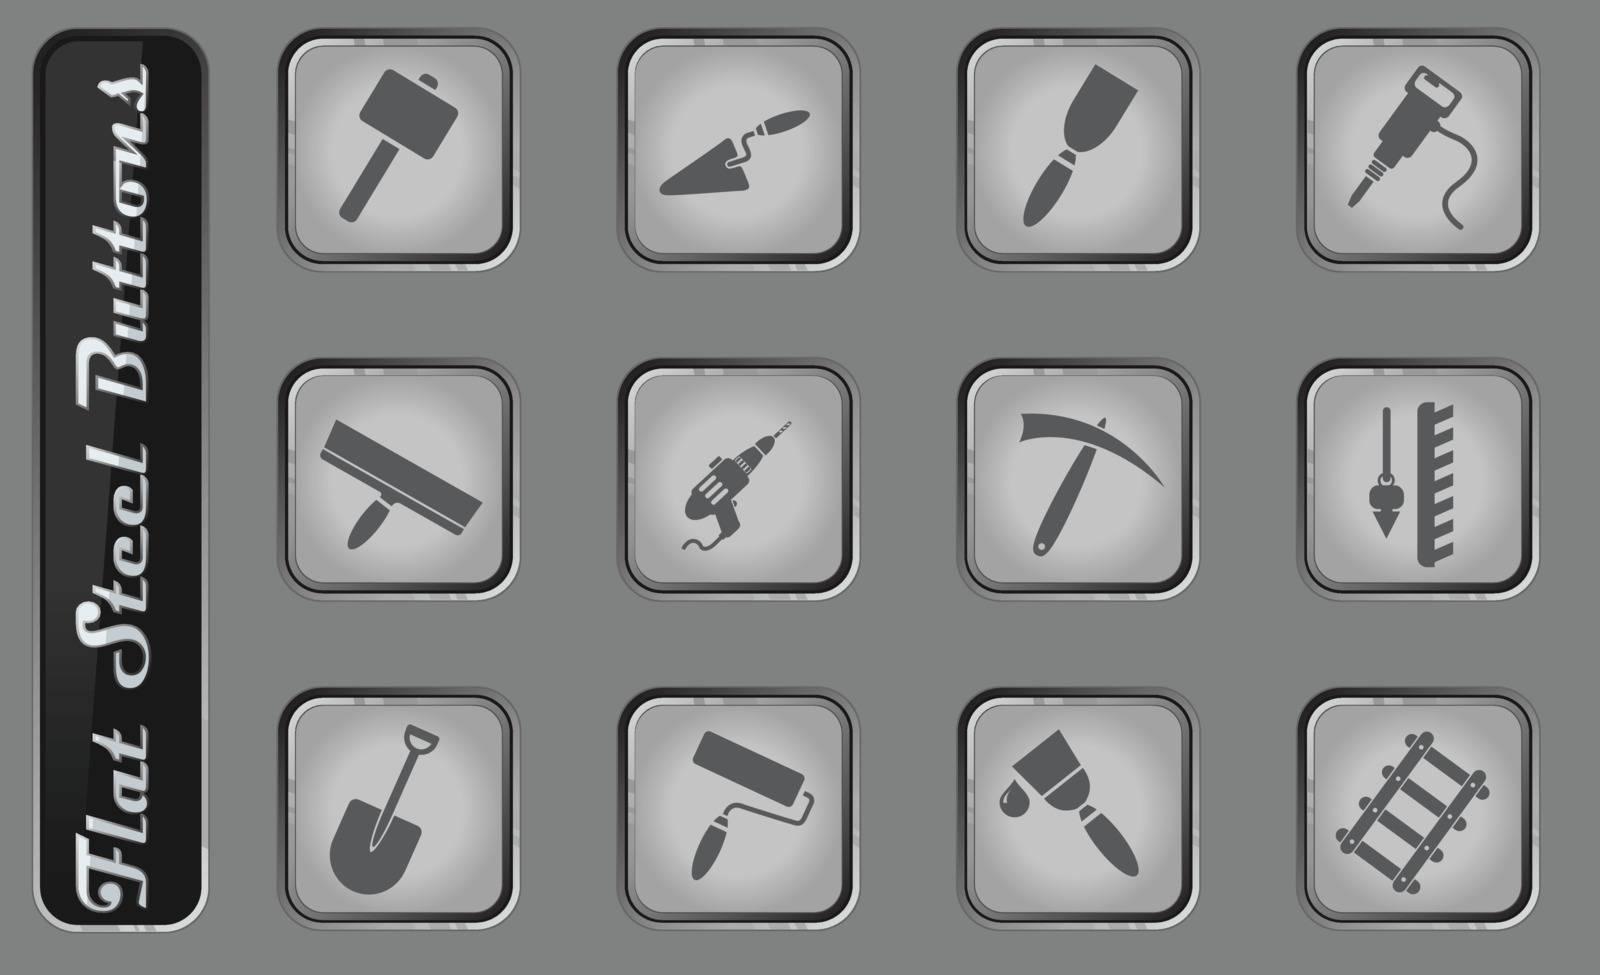 Symbols of building equipment by ayax